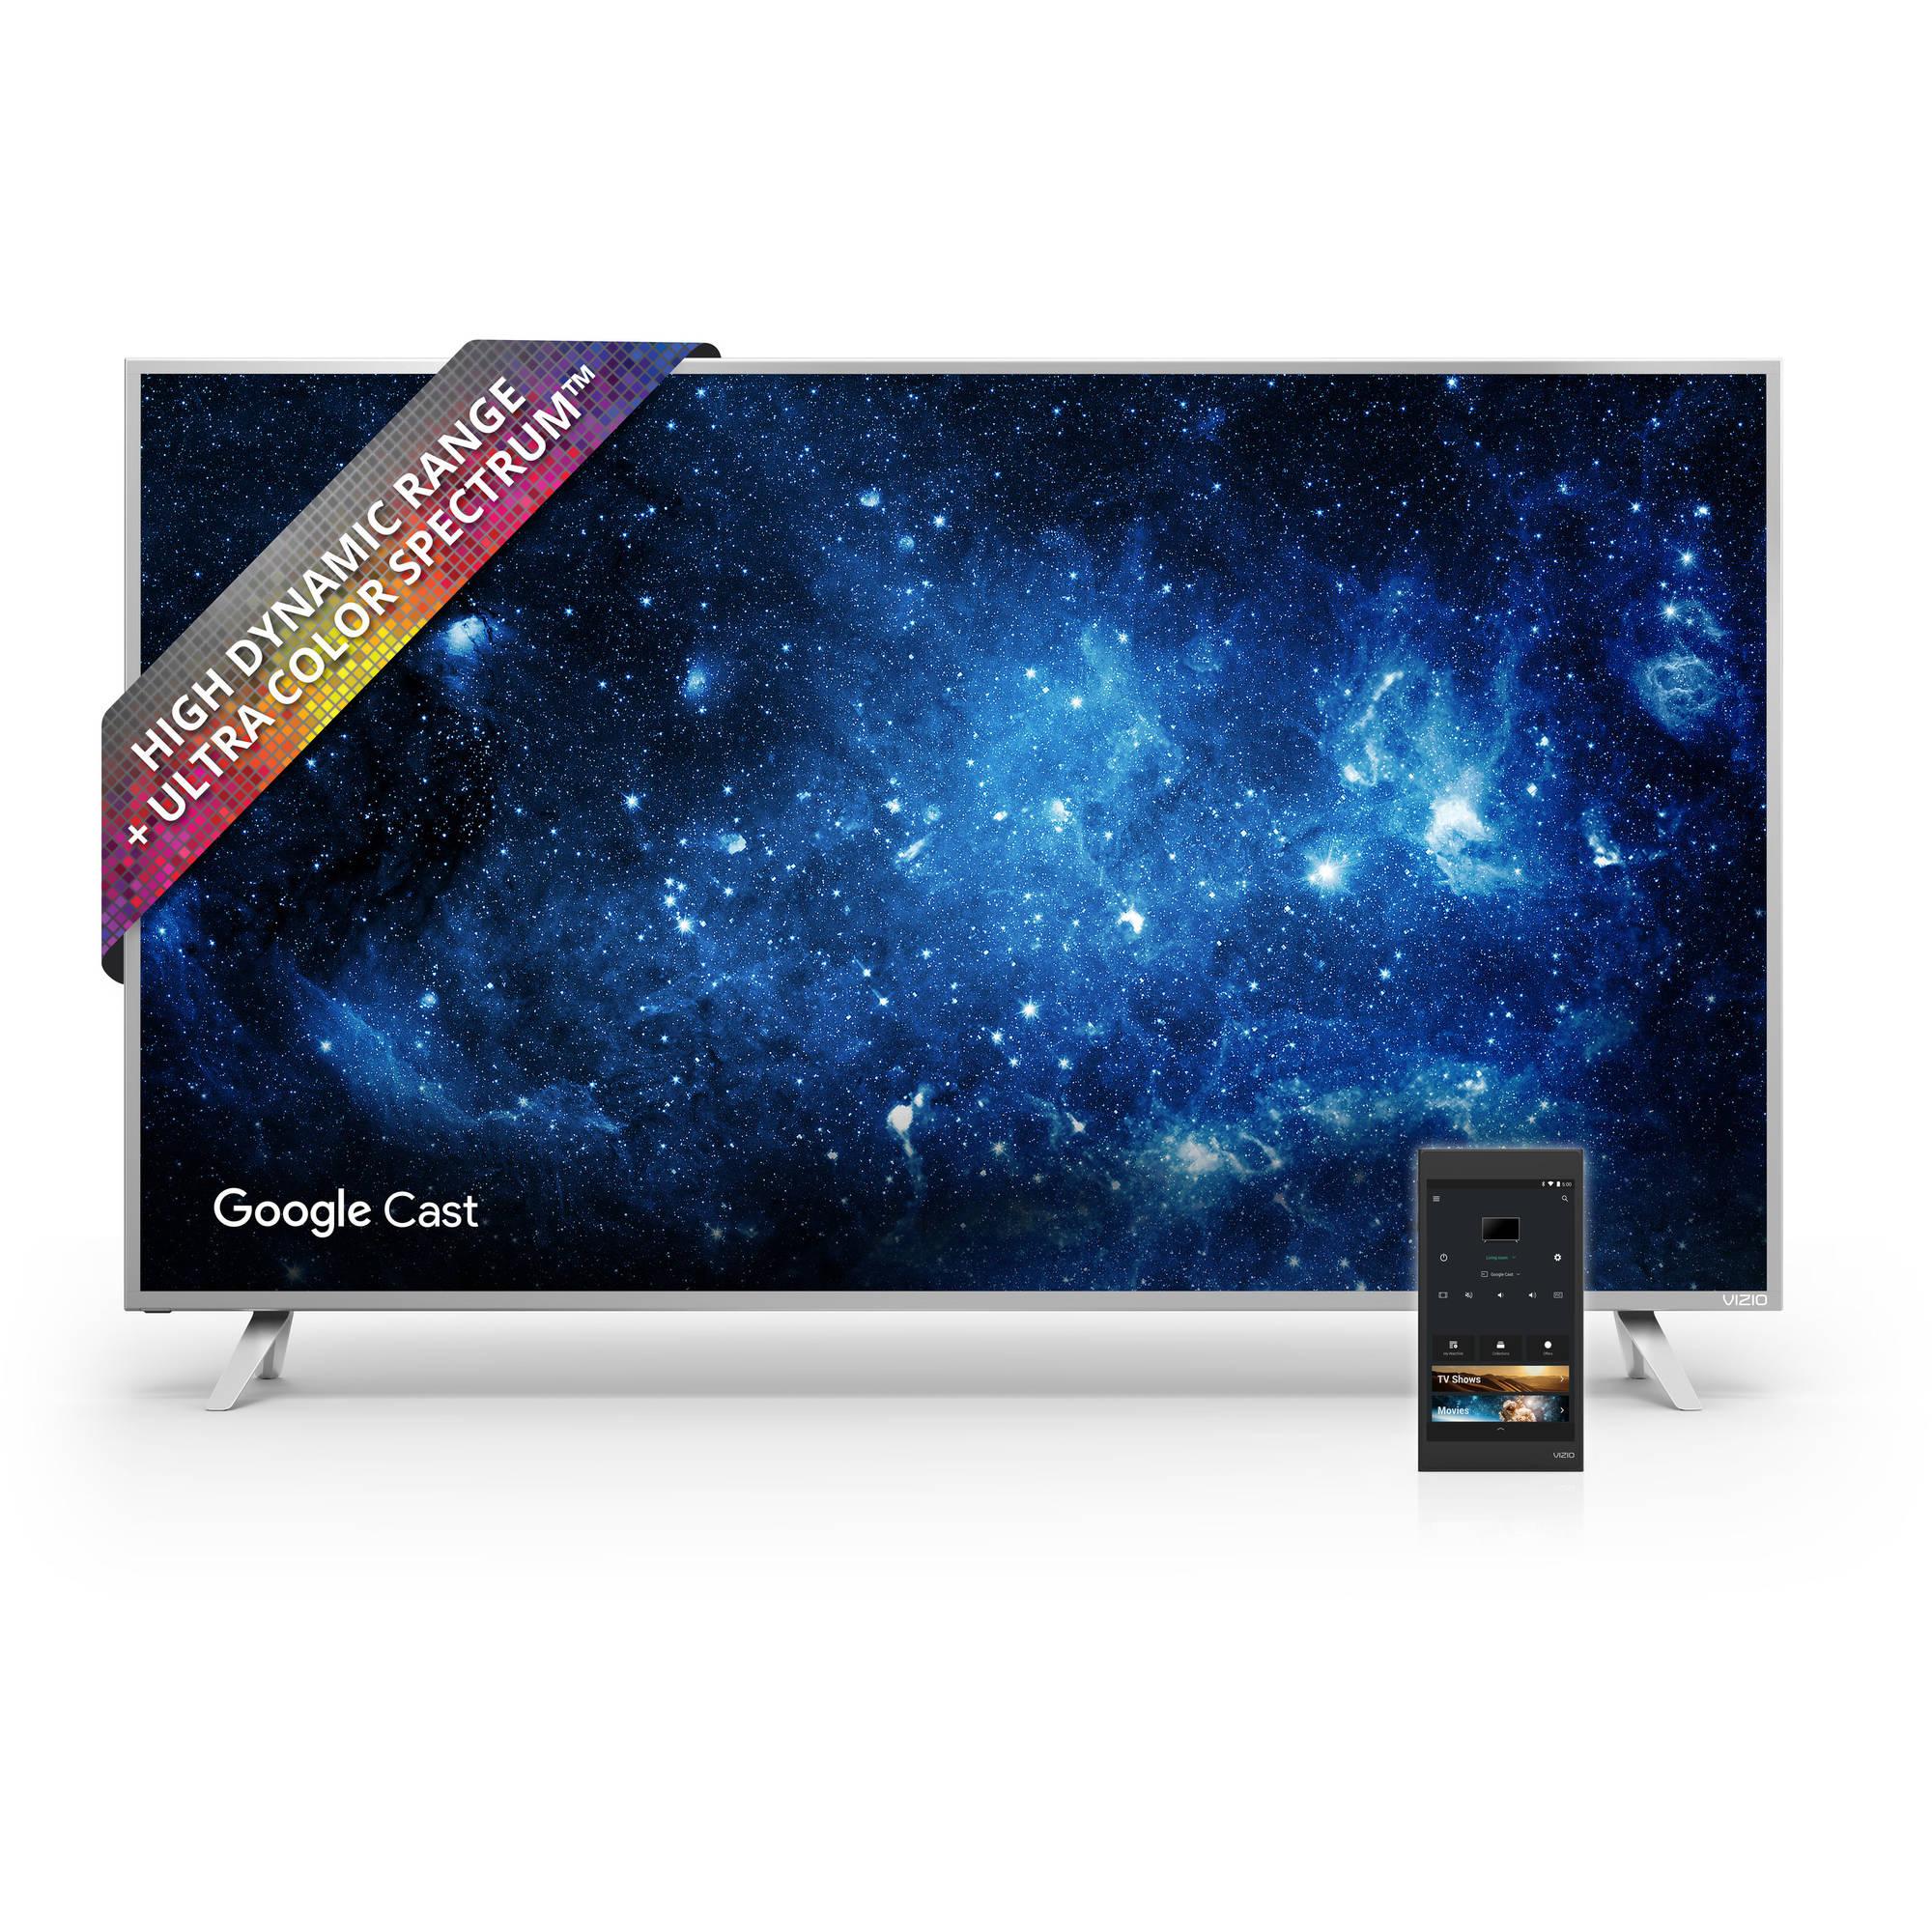 "VIZIO P65-C1 - 65"" Class (64.53"" viewable) - P Series LED TV - Smart TV - 4K UHD (2160p) - full array, local dimming"